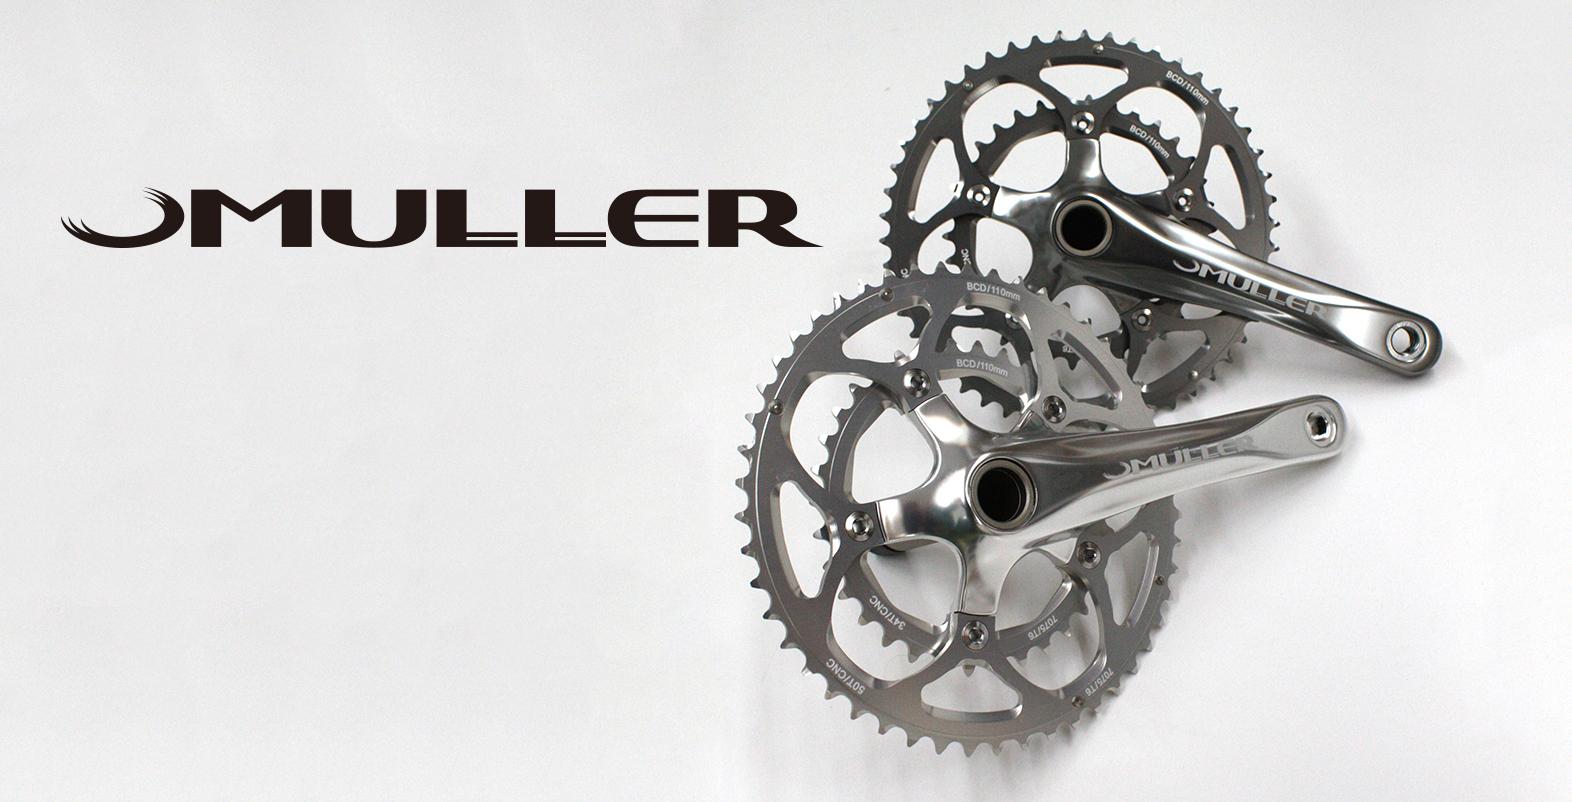 MULLER_Crank_5arm